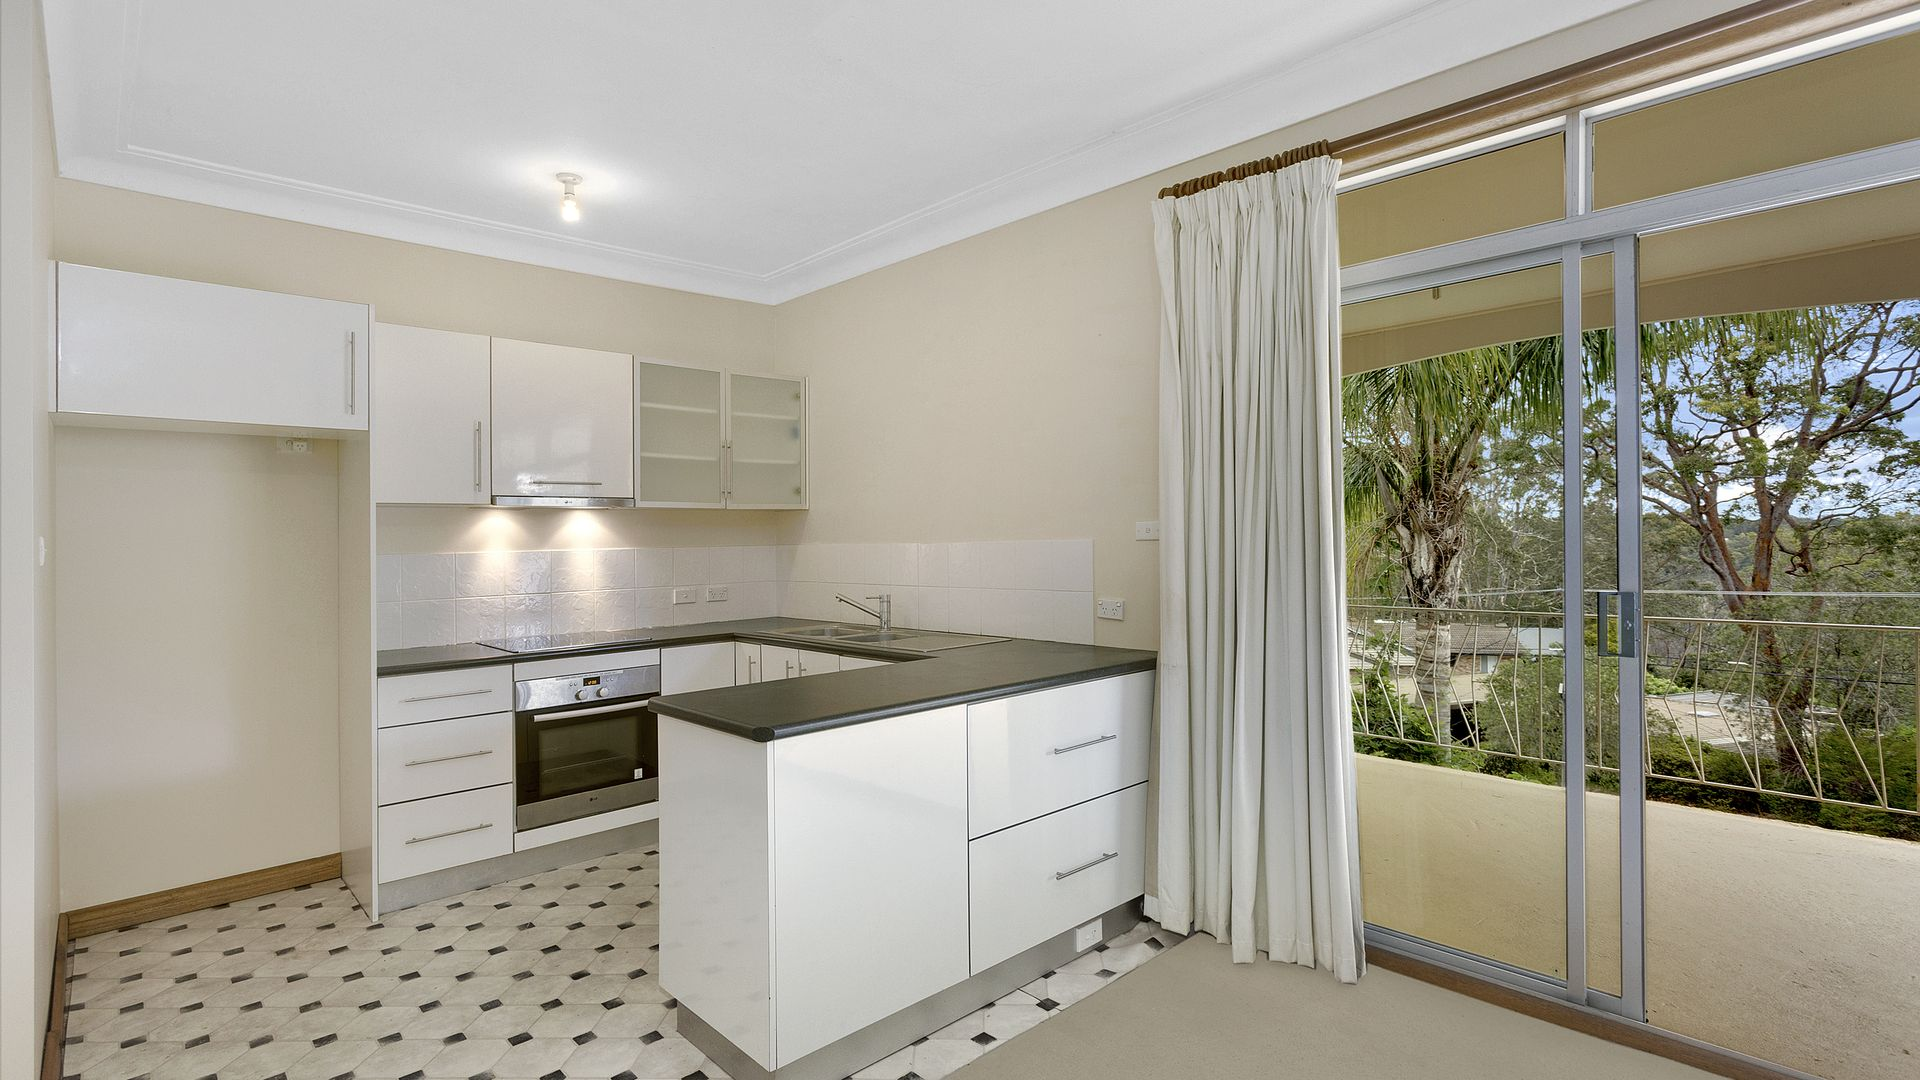 2/62 Ballyshannon Road, Killarney Heights NSW 2087, Image 1